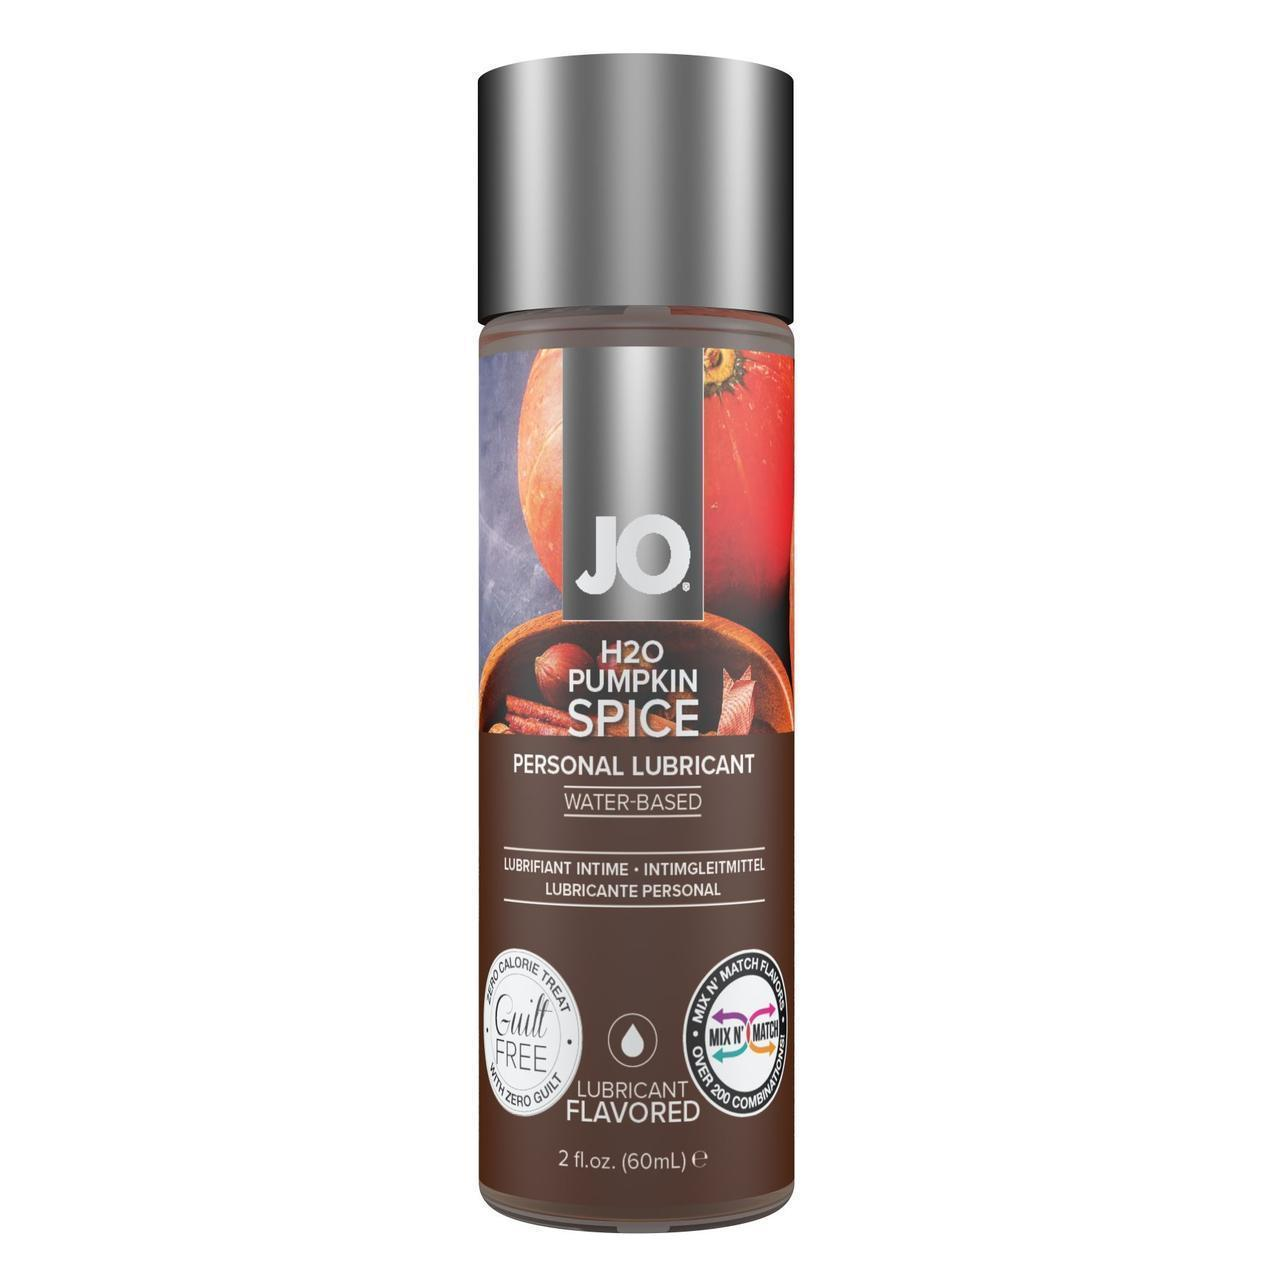 Лубрикант на водной основе System JO H2O - Pumpkin Spice - Limited Edition (60 мл)